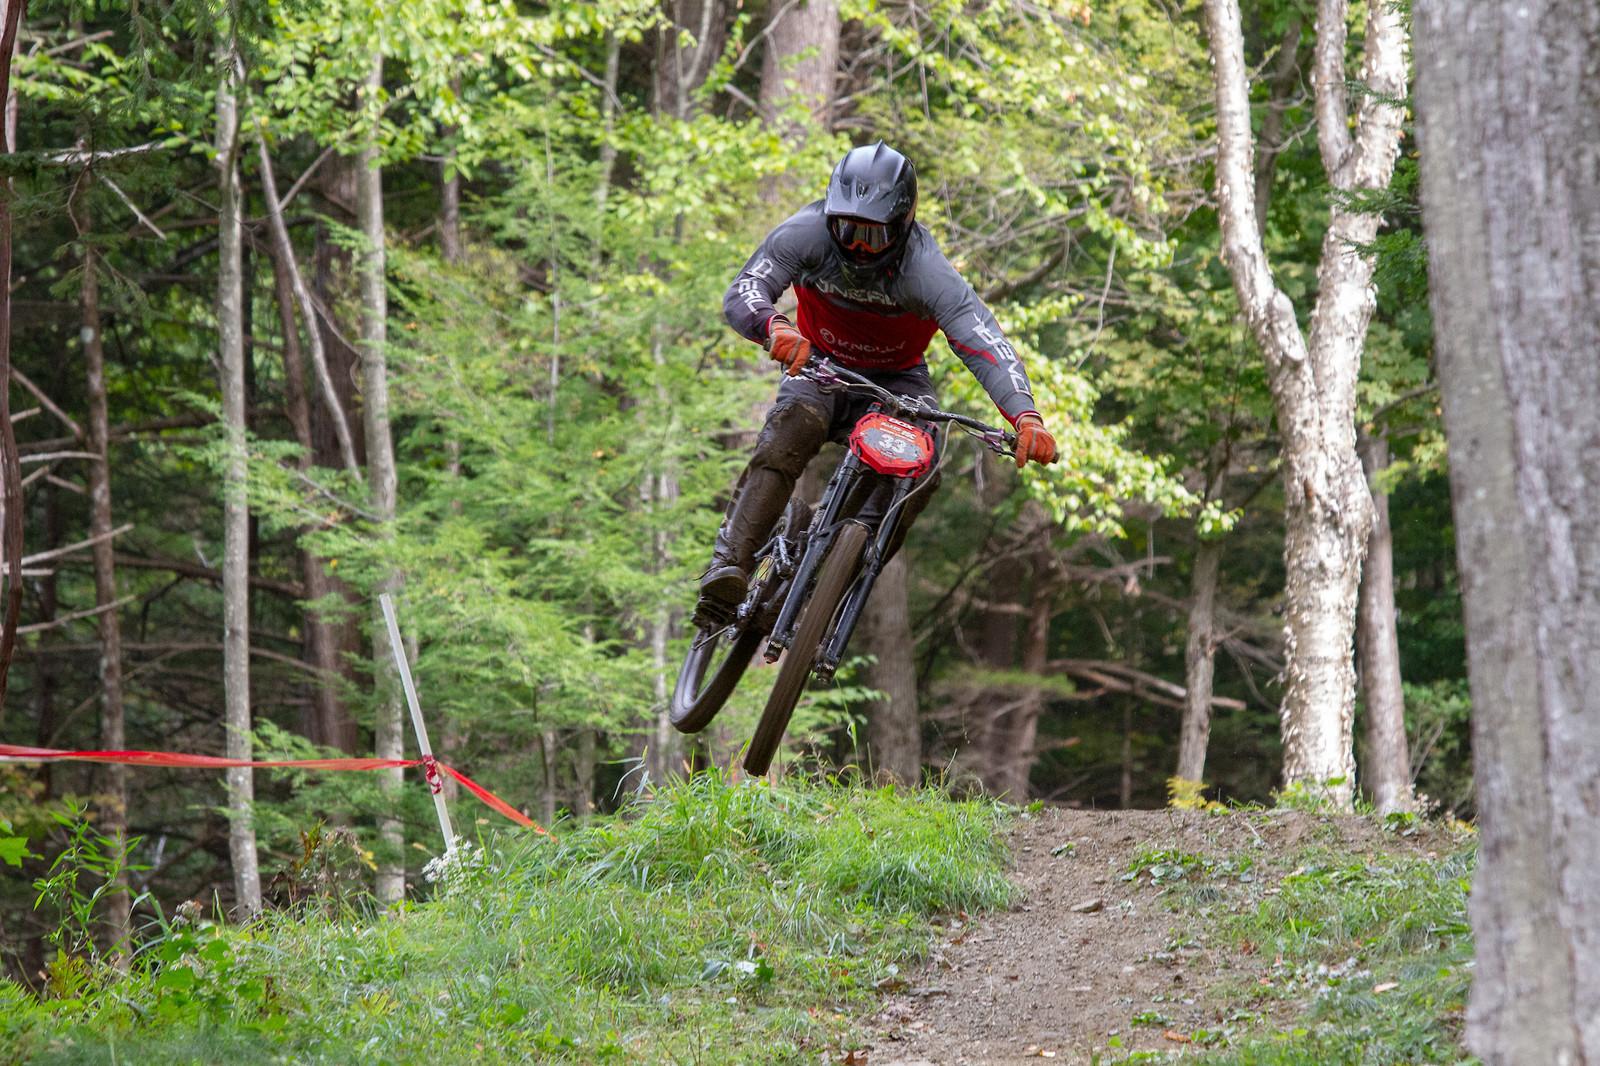 Kevin Wilson - JackRice - Mountain Biking Pictures - Vital MTB